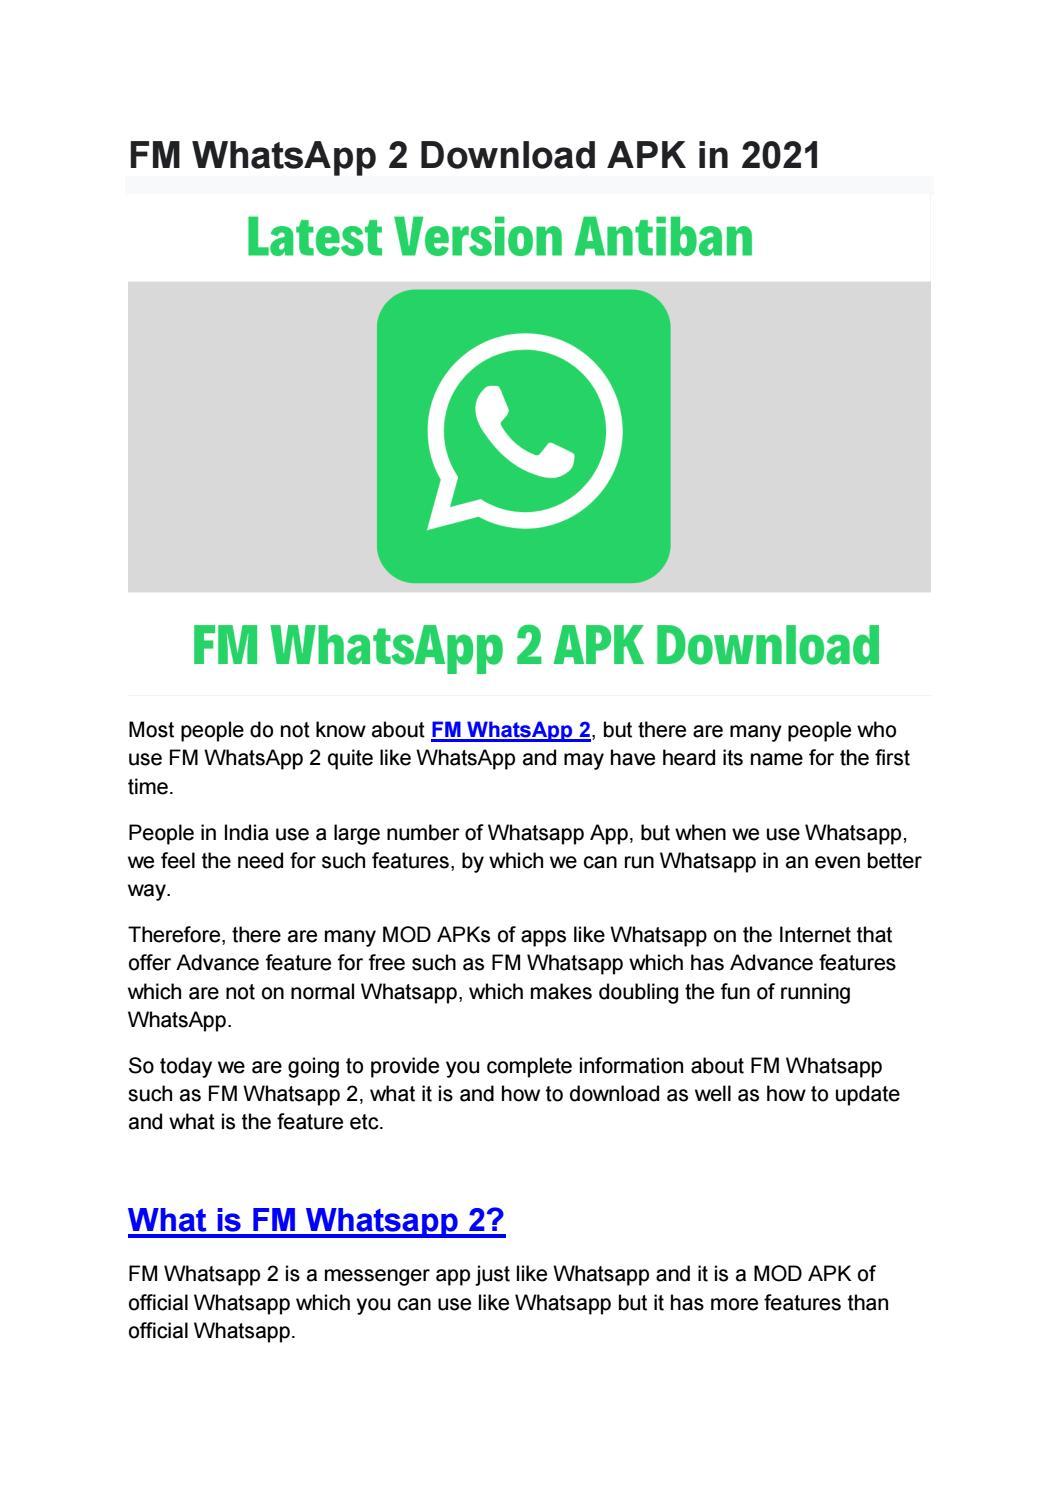 Fm Whatsapp 2 Download Apk In 2021 By Digital Monk Issuu